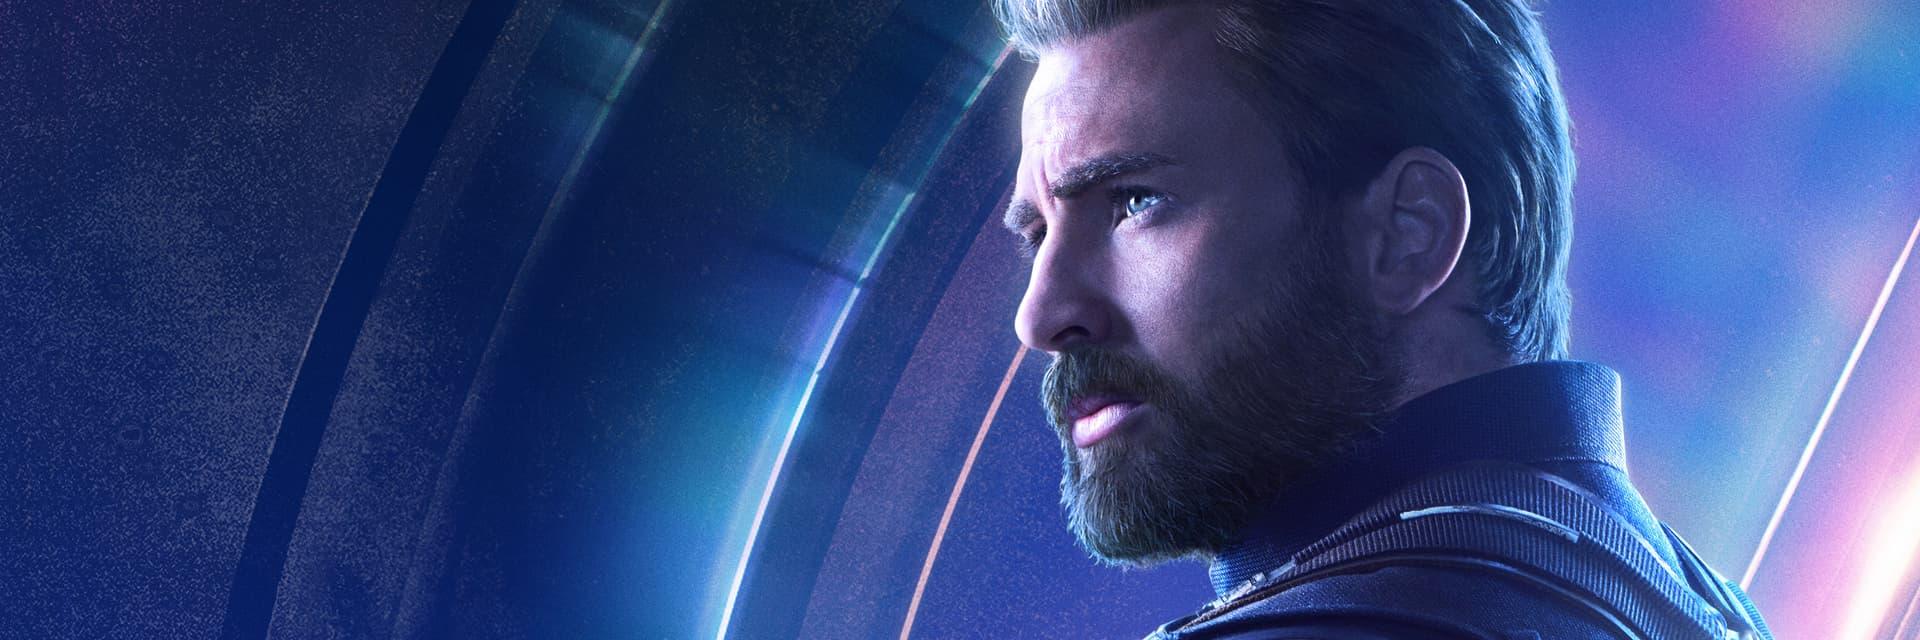 Captain America (Steve Rogers) | Characters | Marvel